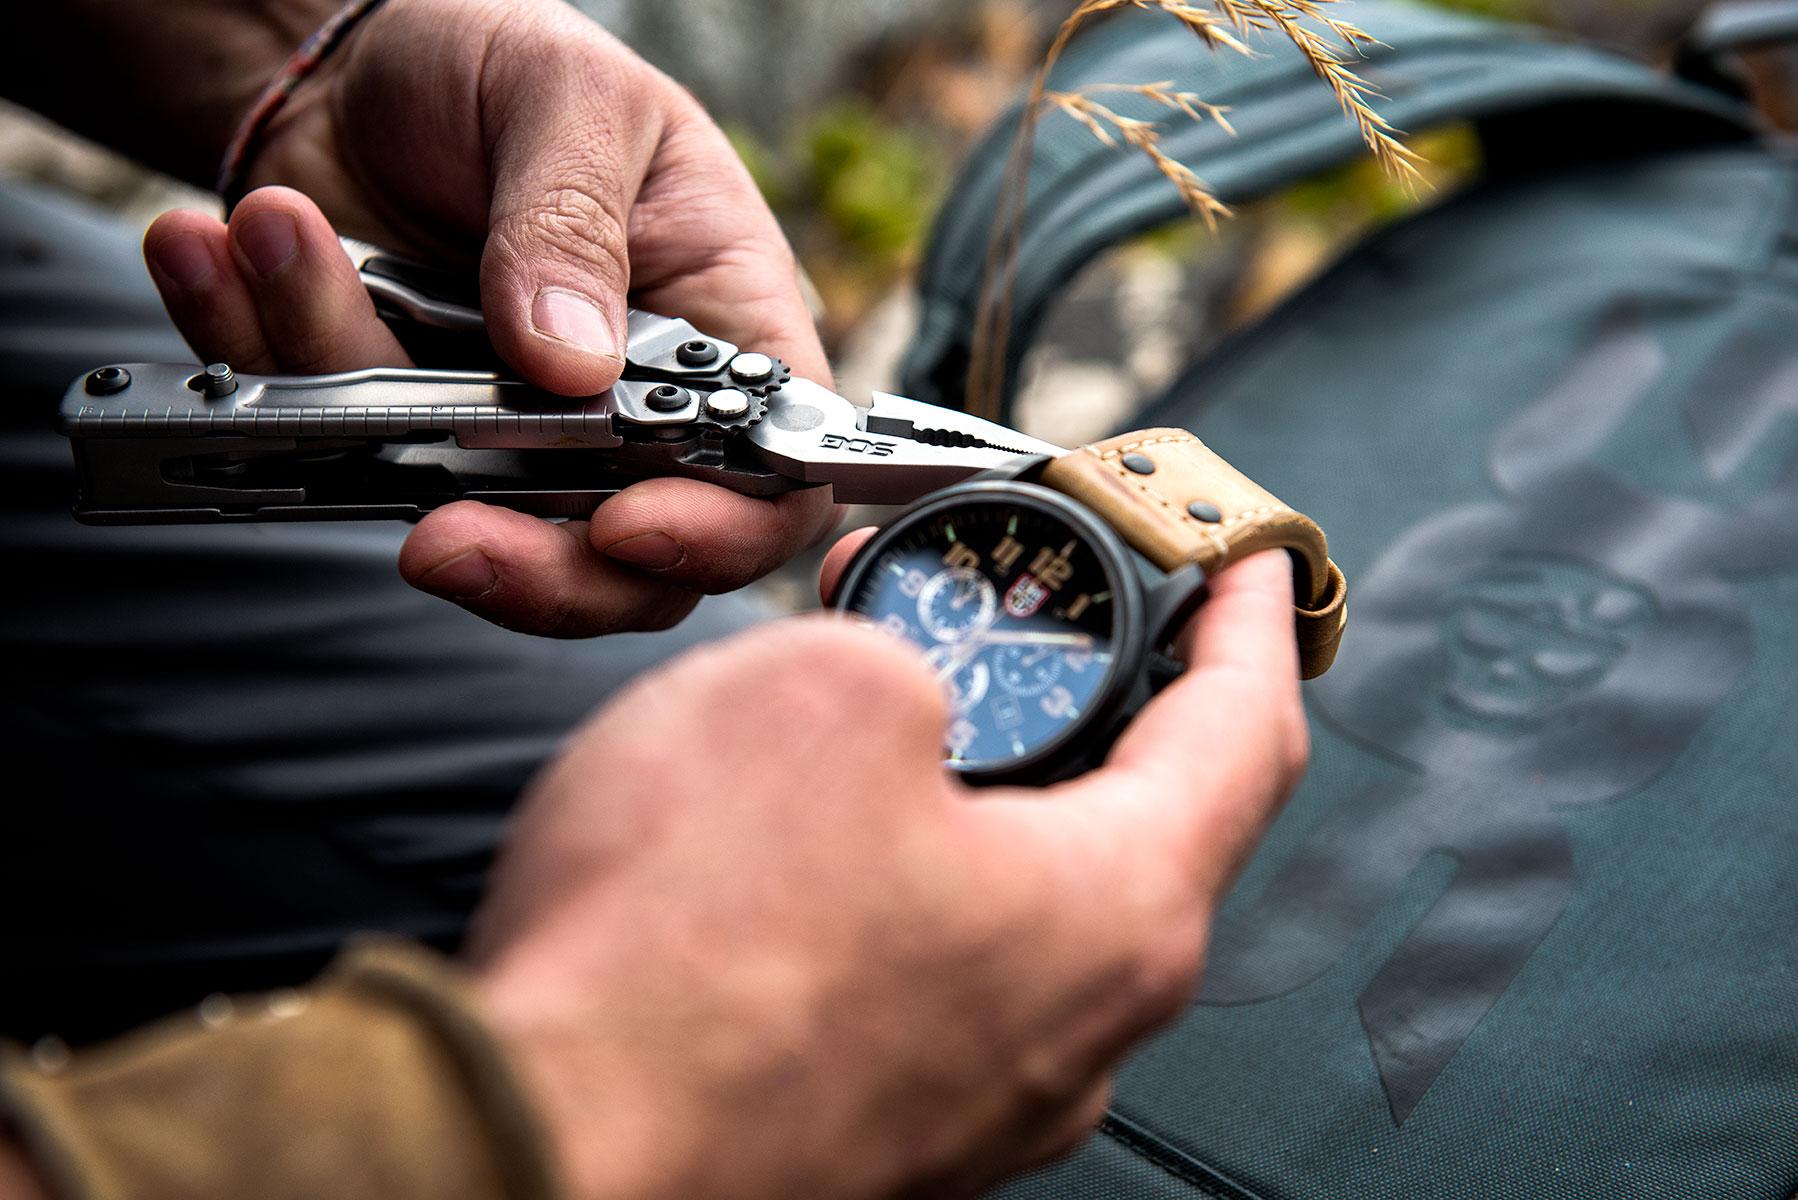 austin-trigg-brave-wilderness-alaska-SOG-Multi-Tool-watch-repair.jpg